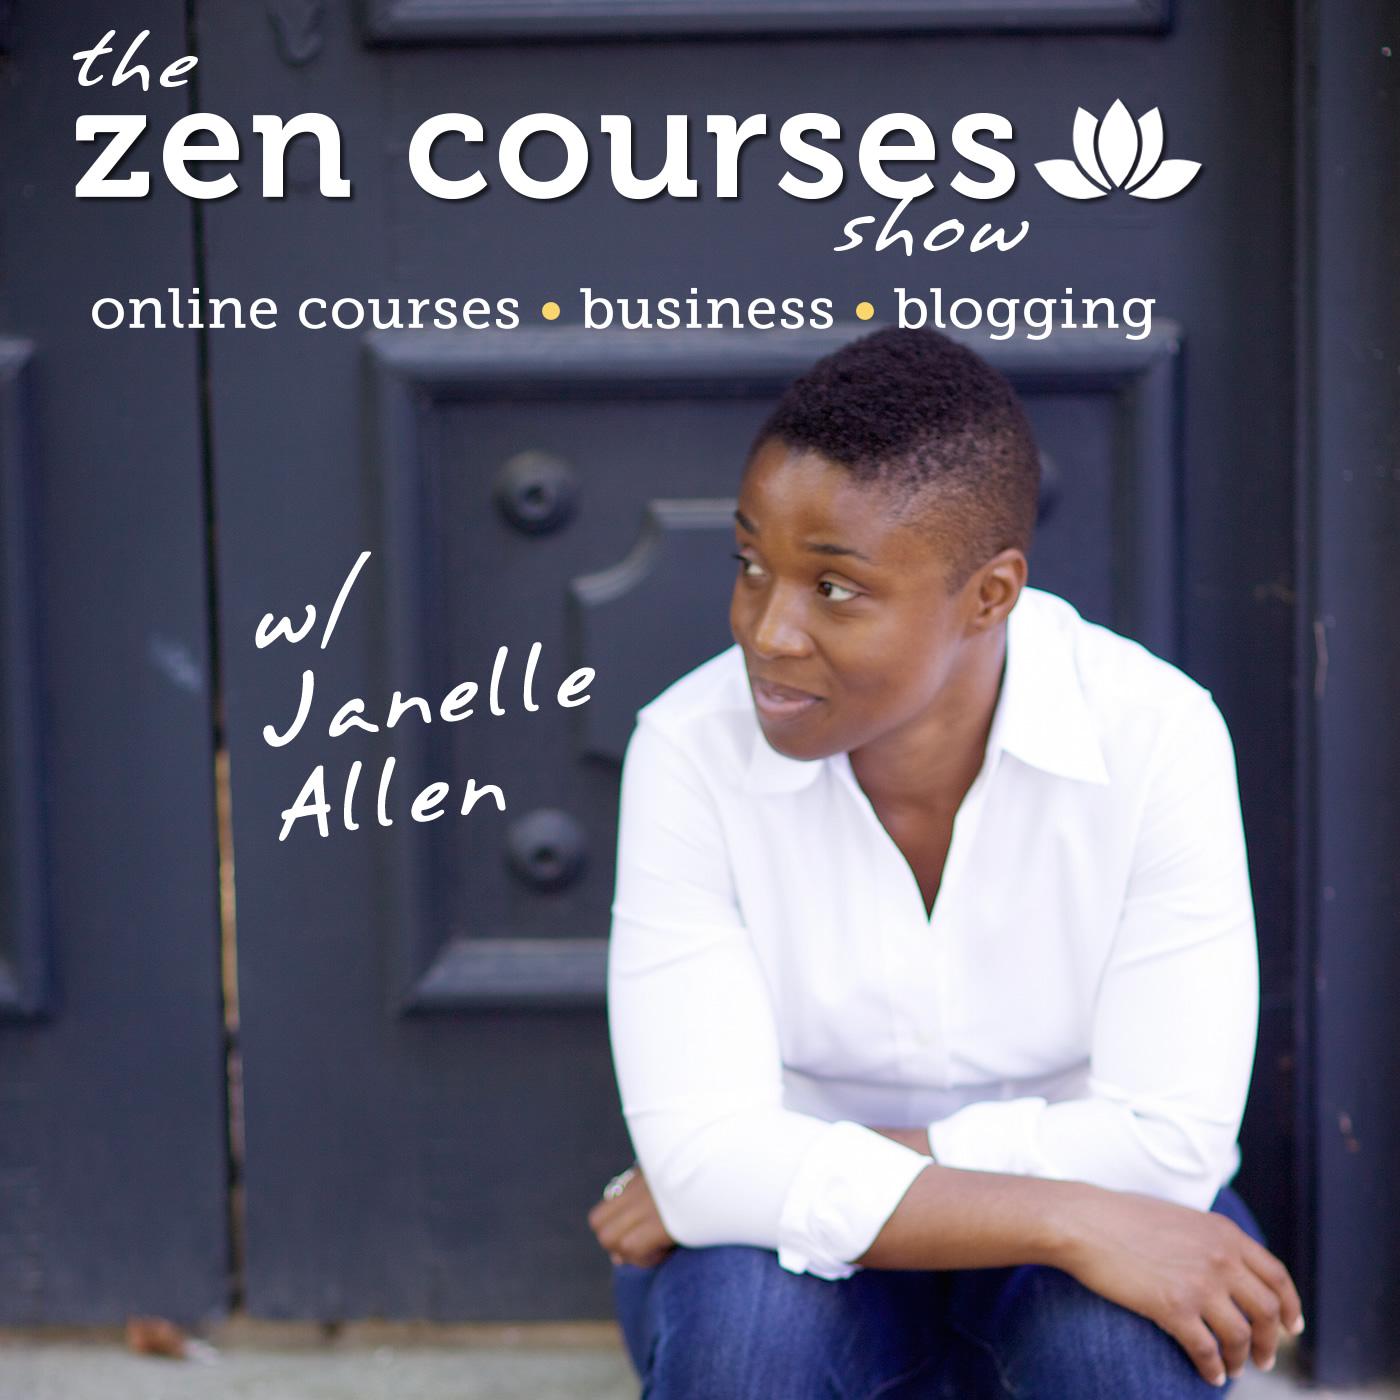 The Zen Courses Show with Janelle Allen: Make Online Courses that Matter